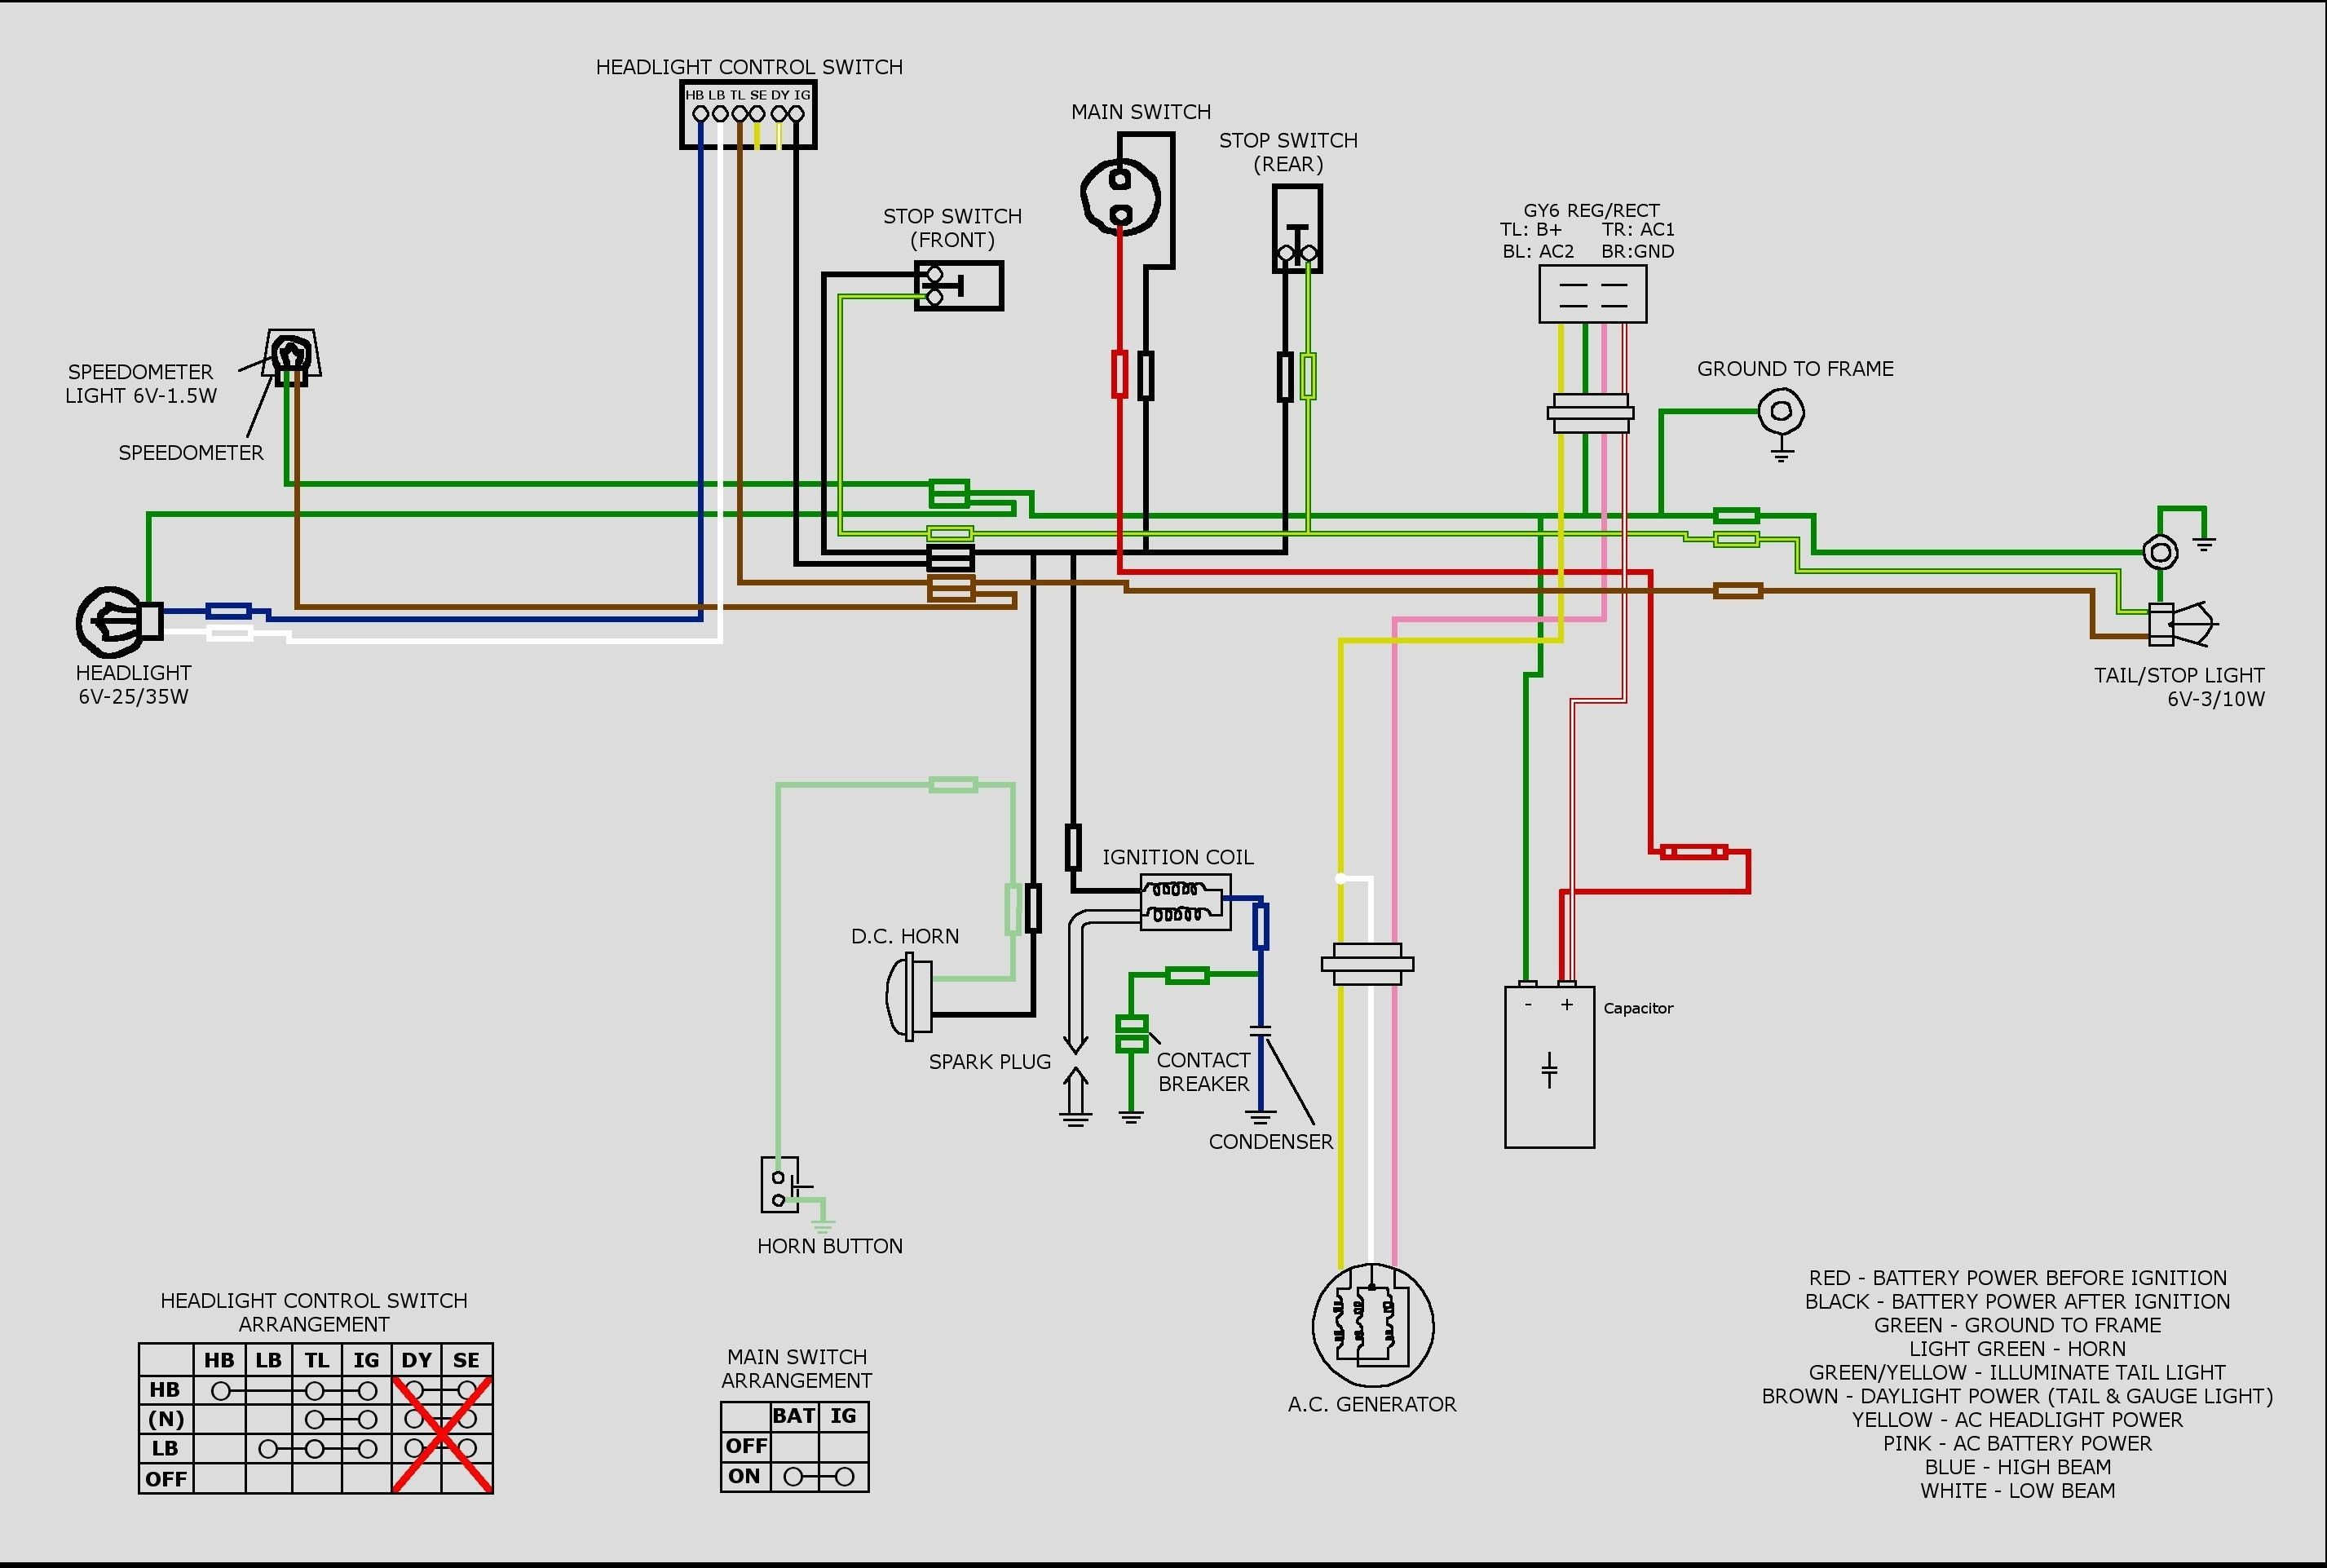 Chrysler Crossfire Engine Diagram Kinetic Honda Wiring Diagram Of Chrysler Crossfire Engine Diagram